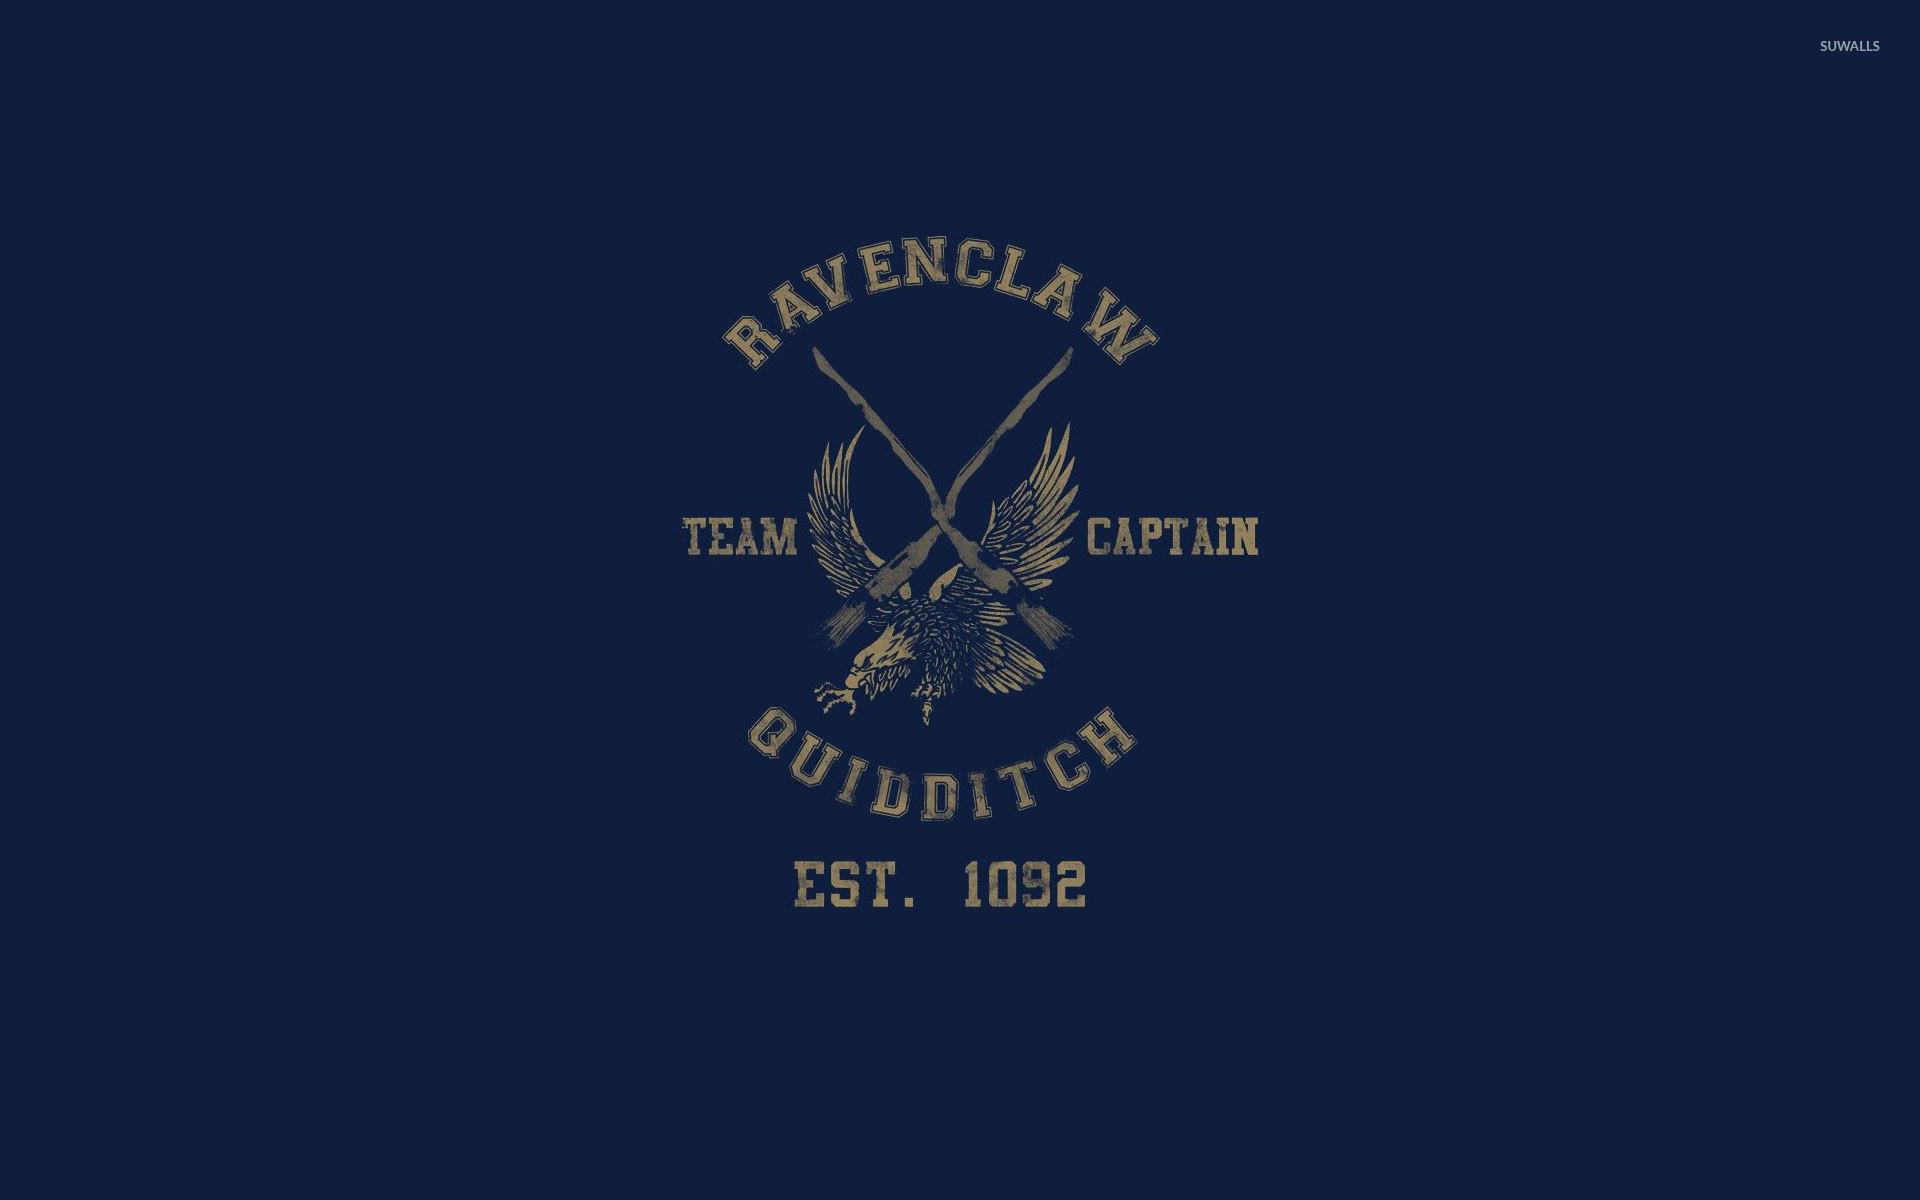 Ravenclaw Quidditch team – Harry Potter wallpaper jpg